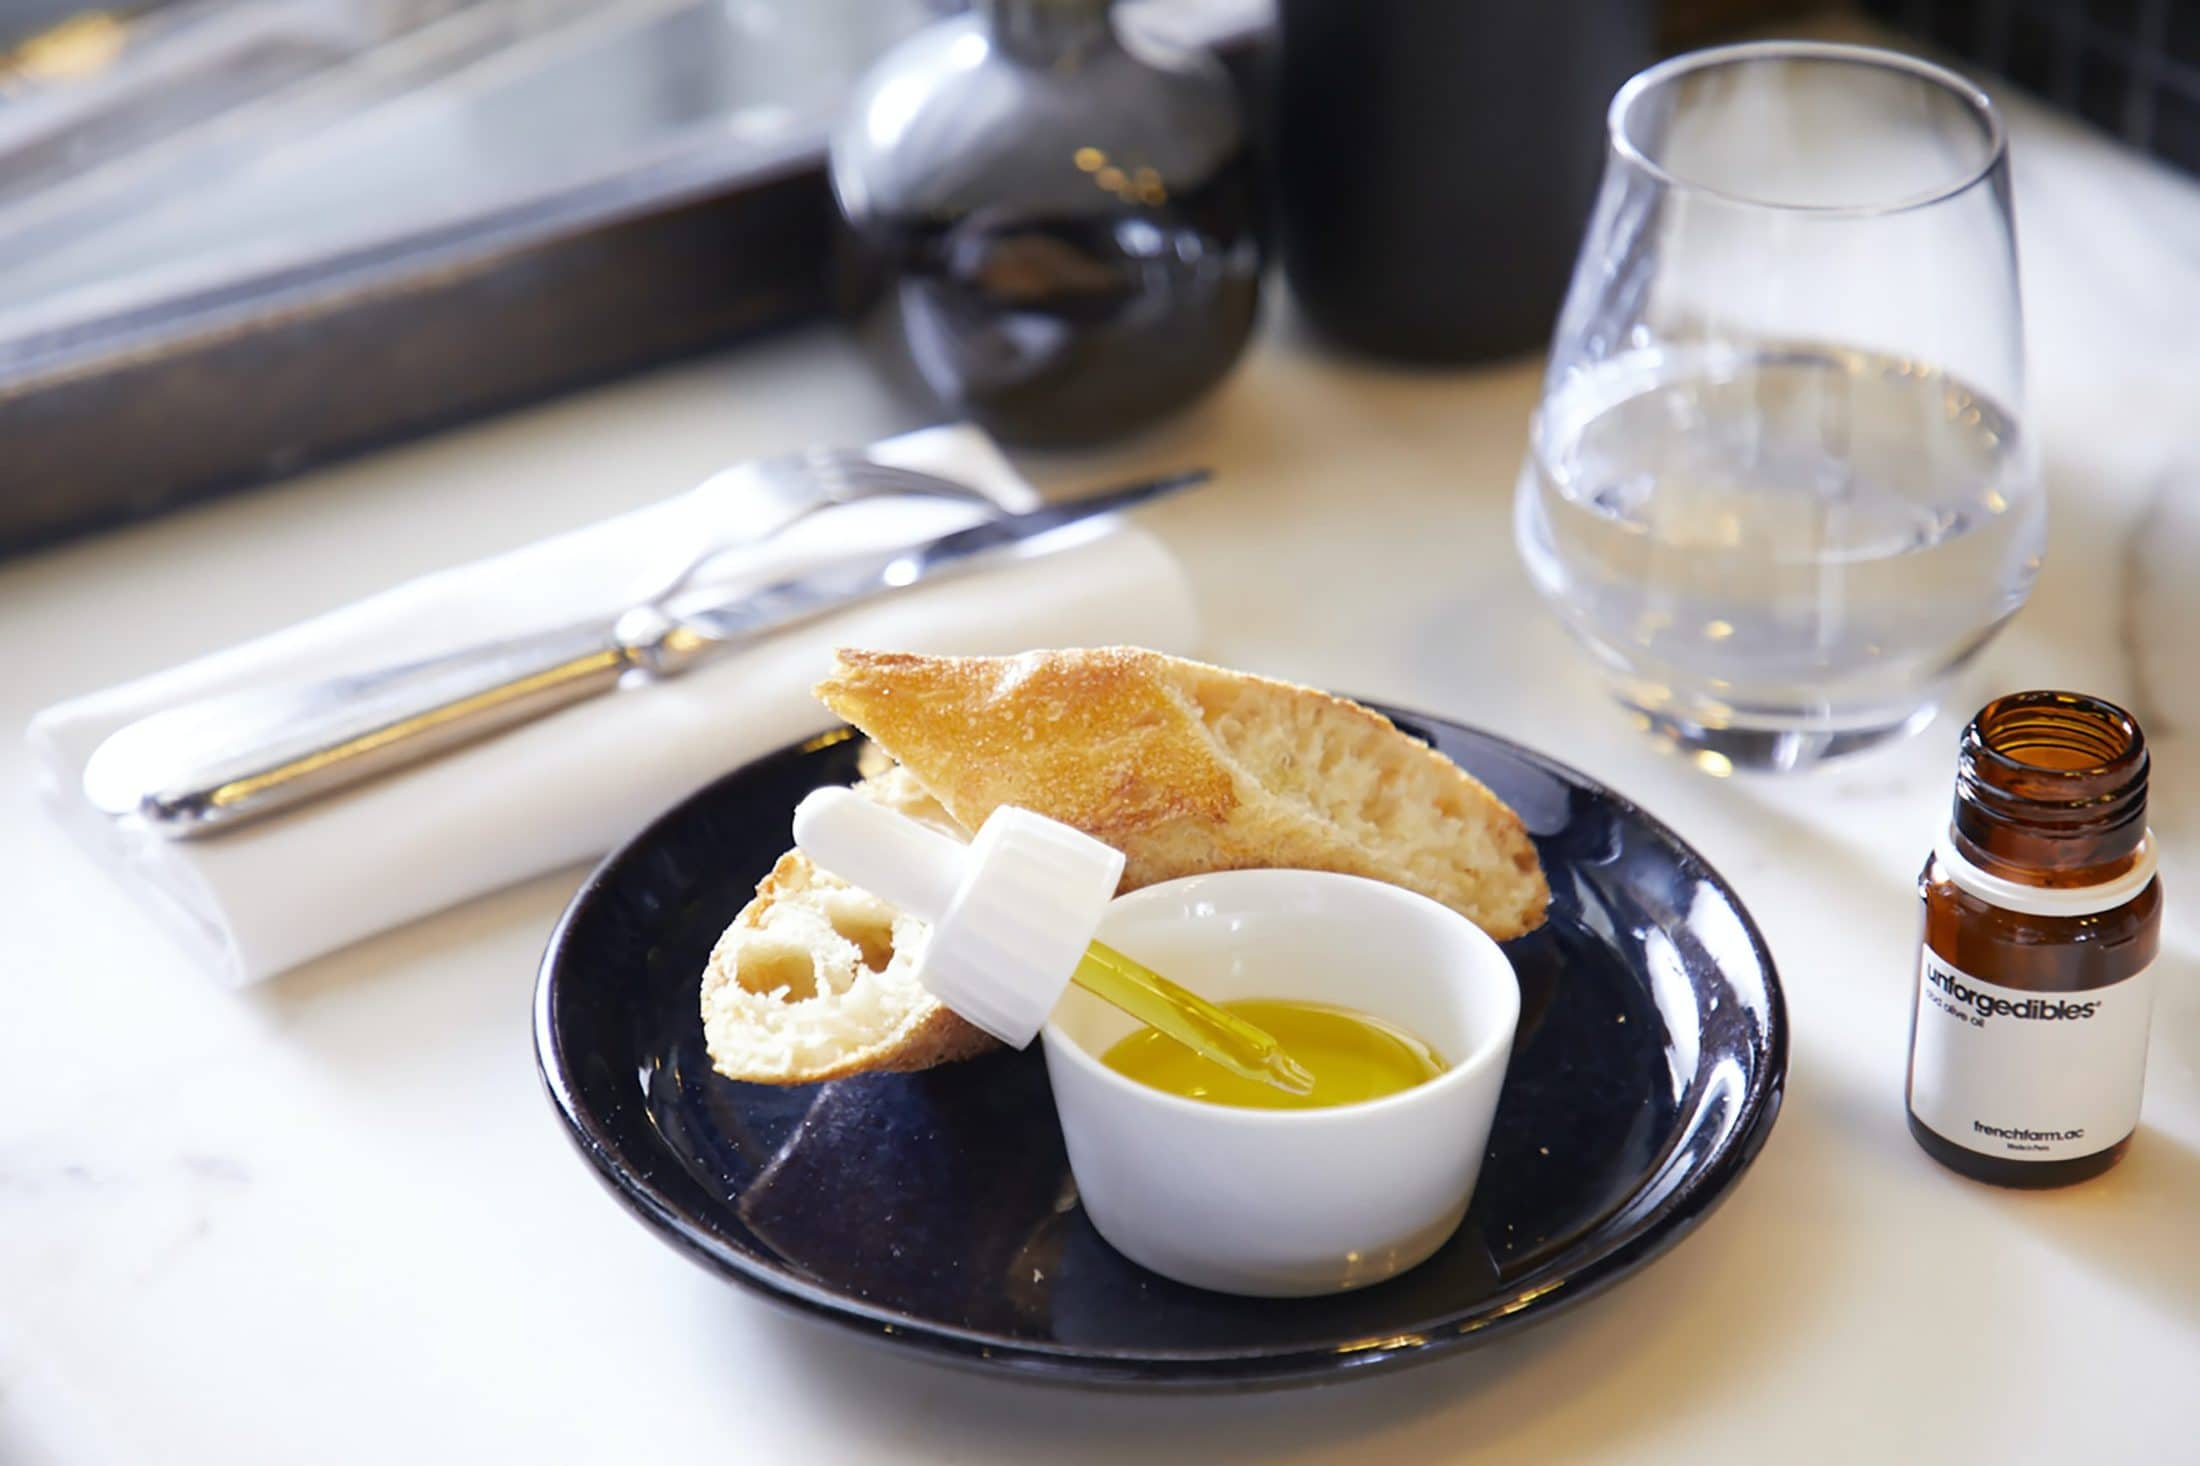 bread on black ceramic plate beside clear drinking glass